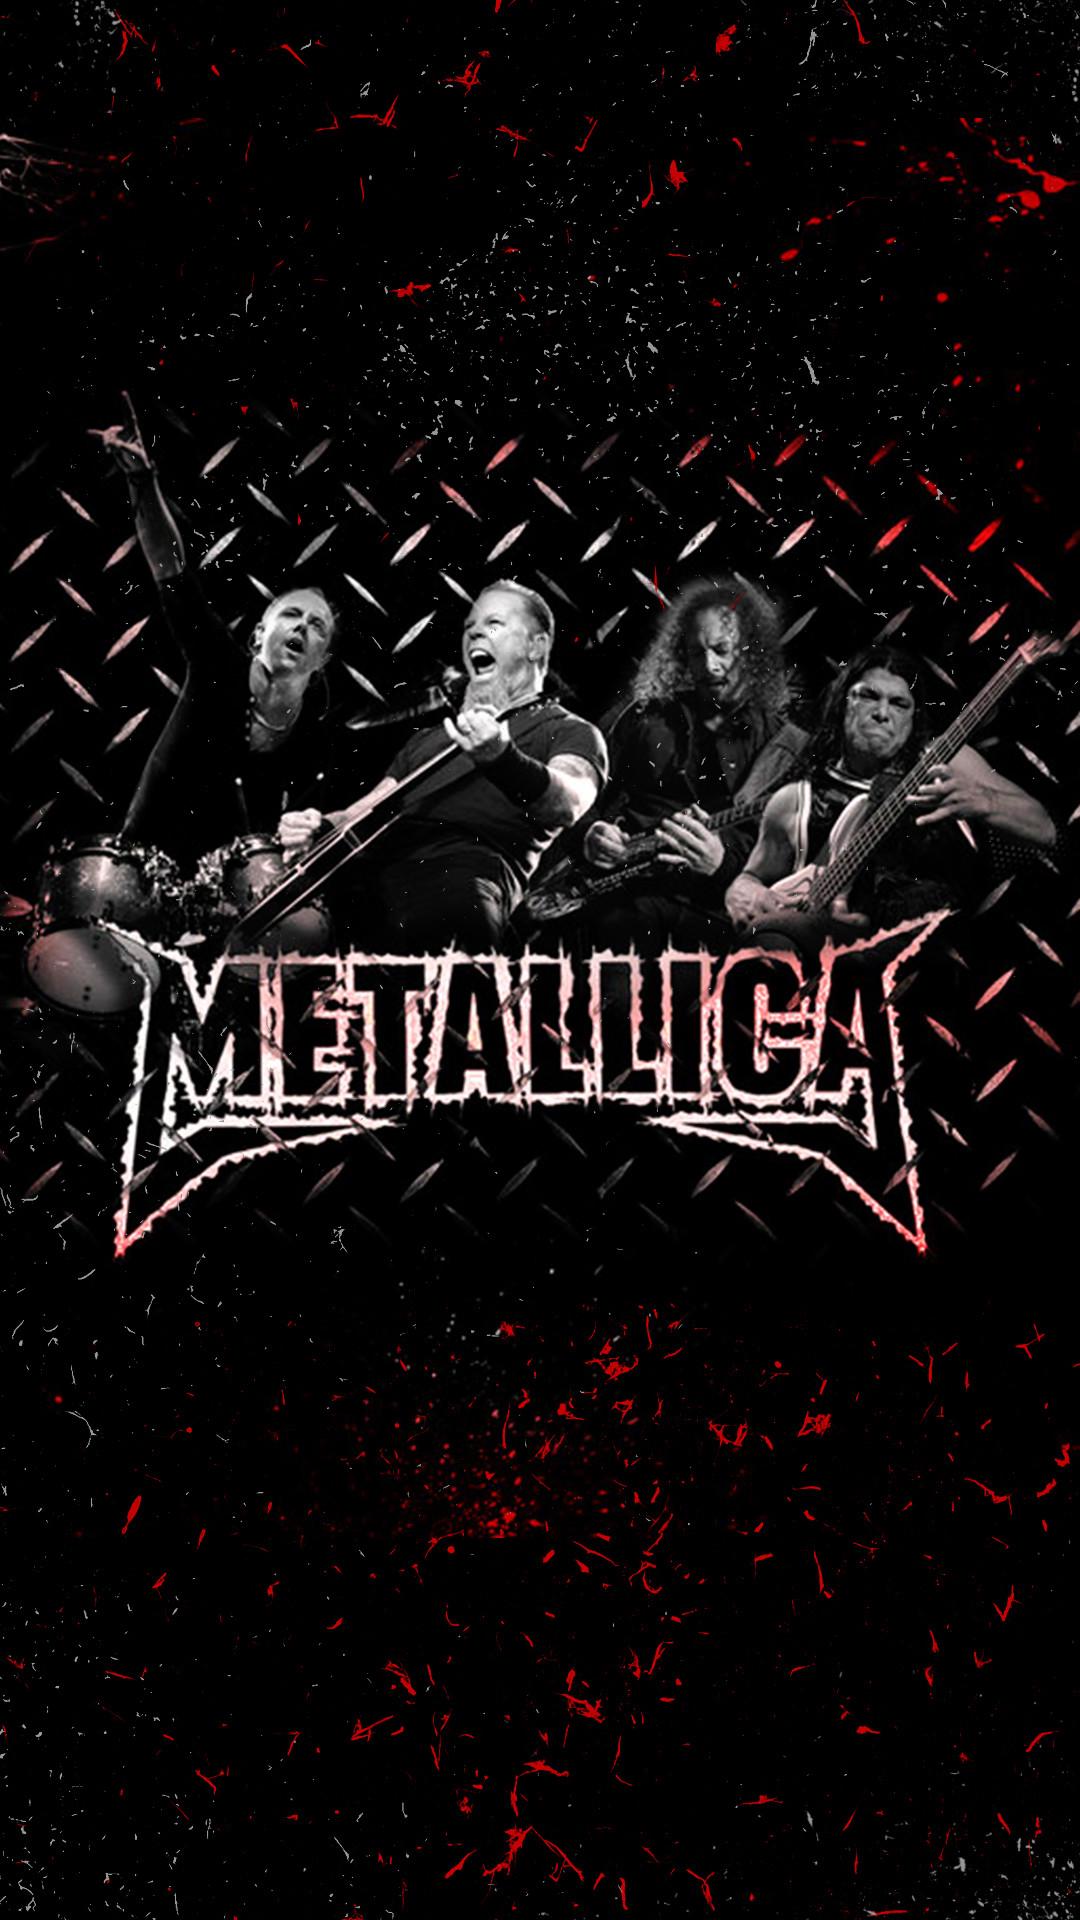 Metallica Wallpapers Hd 69 Images